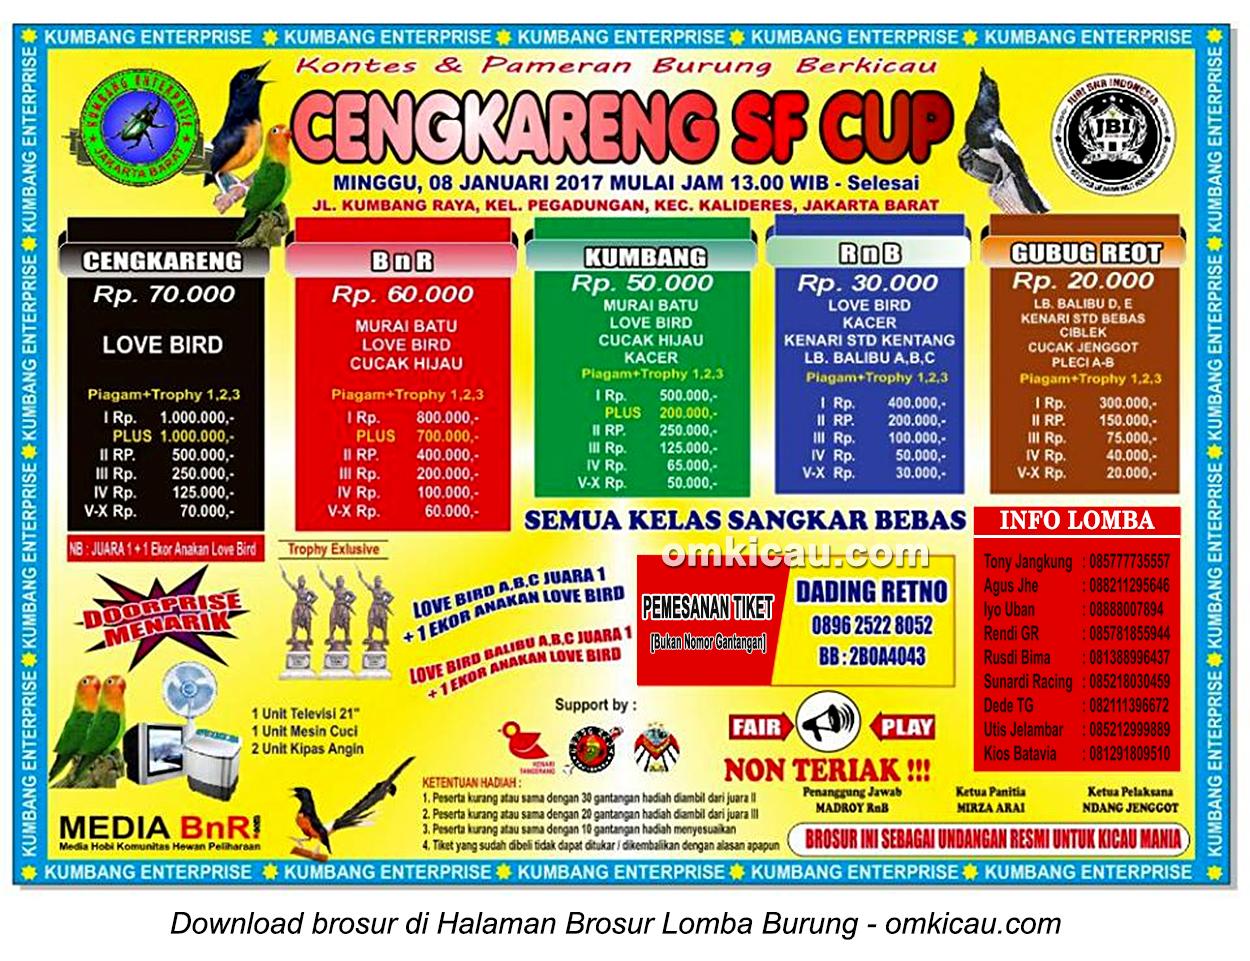 Brosur Lomba Burung Berkicau Cengkareng SF Cup, Jakarta Barat, 8 Januari 2017